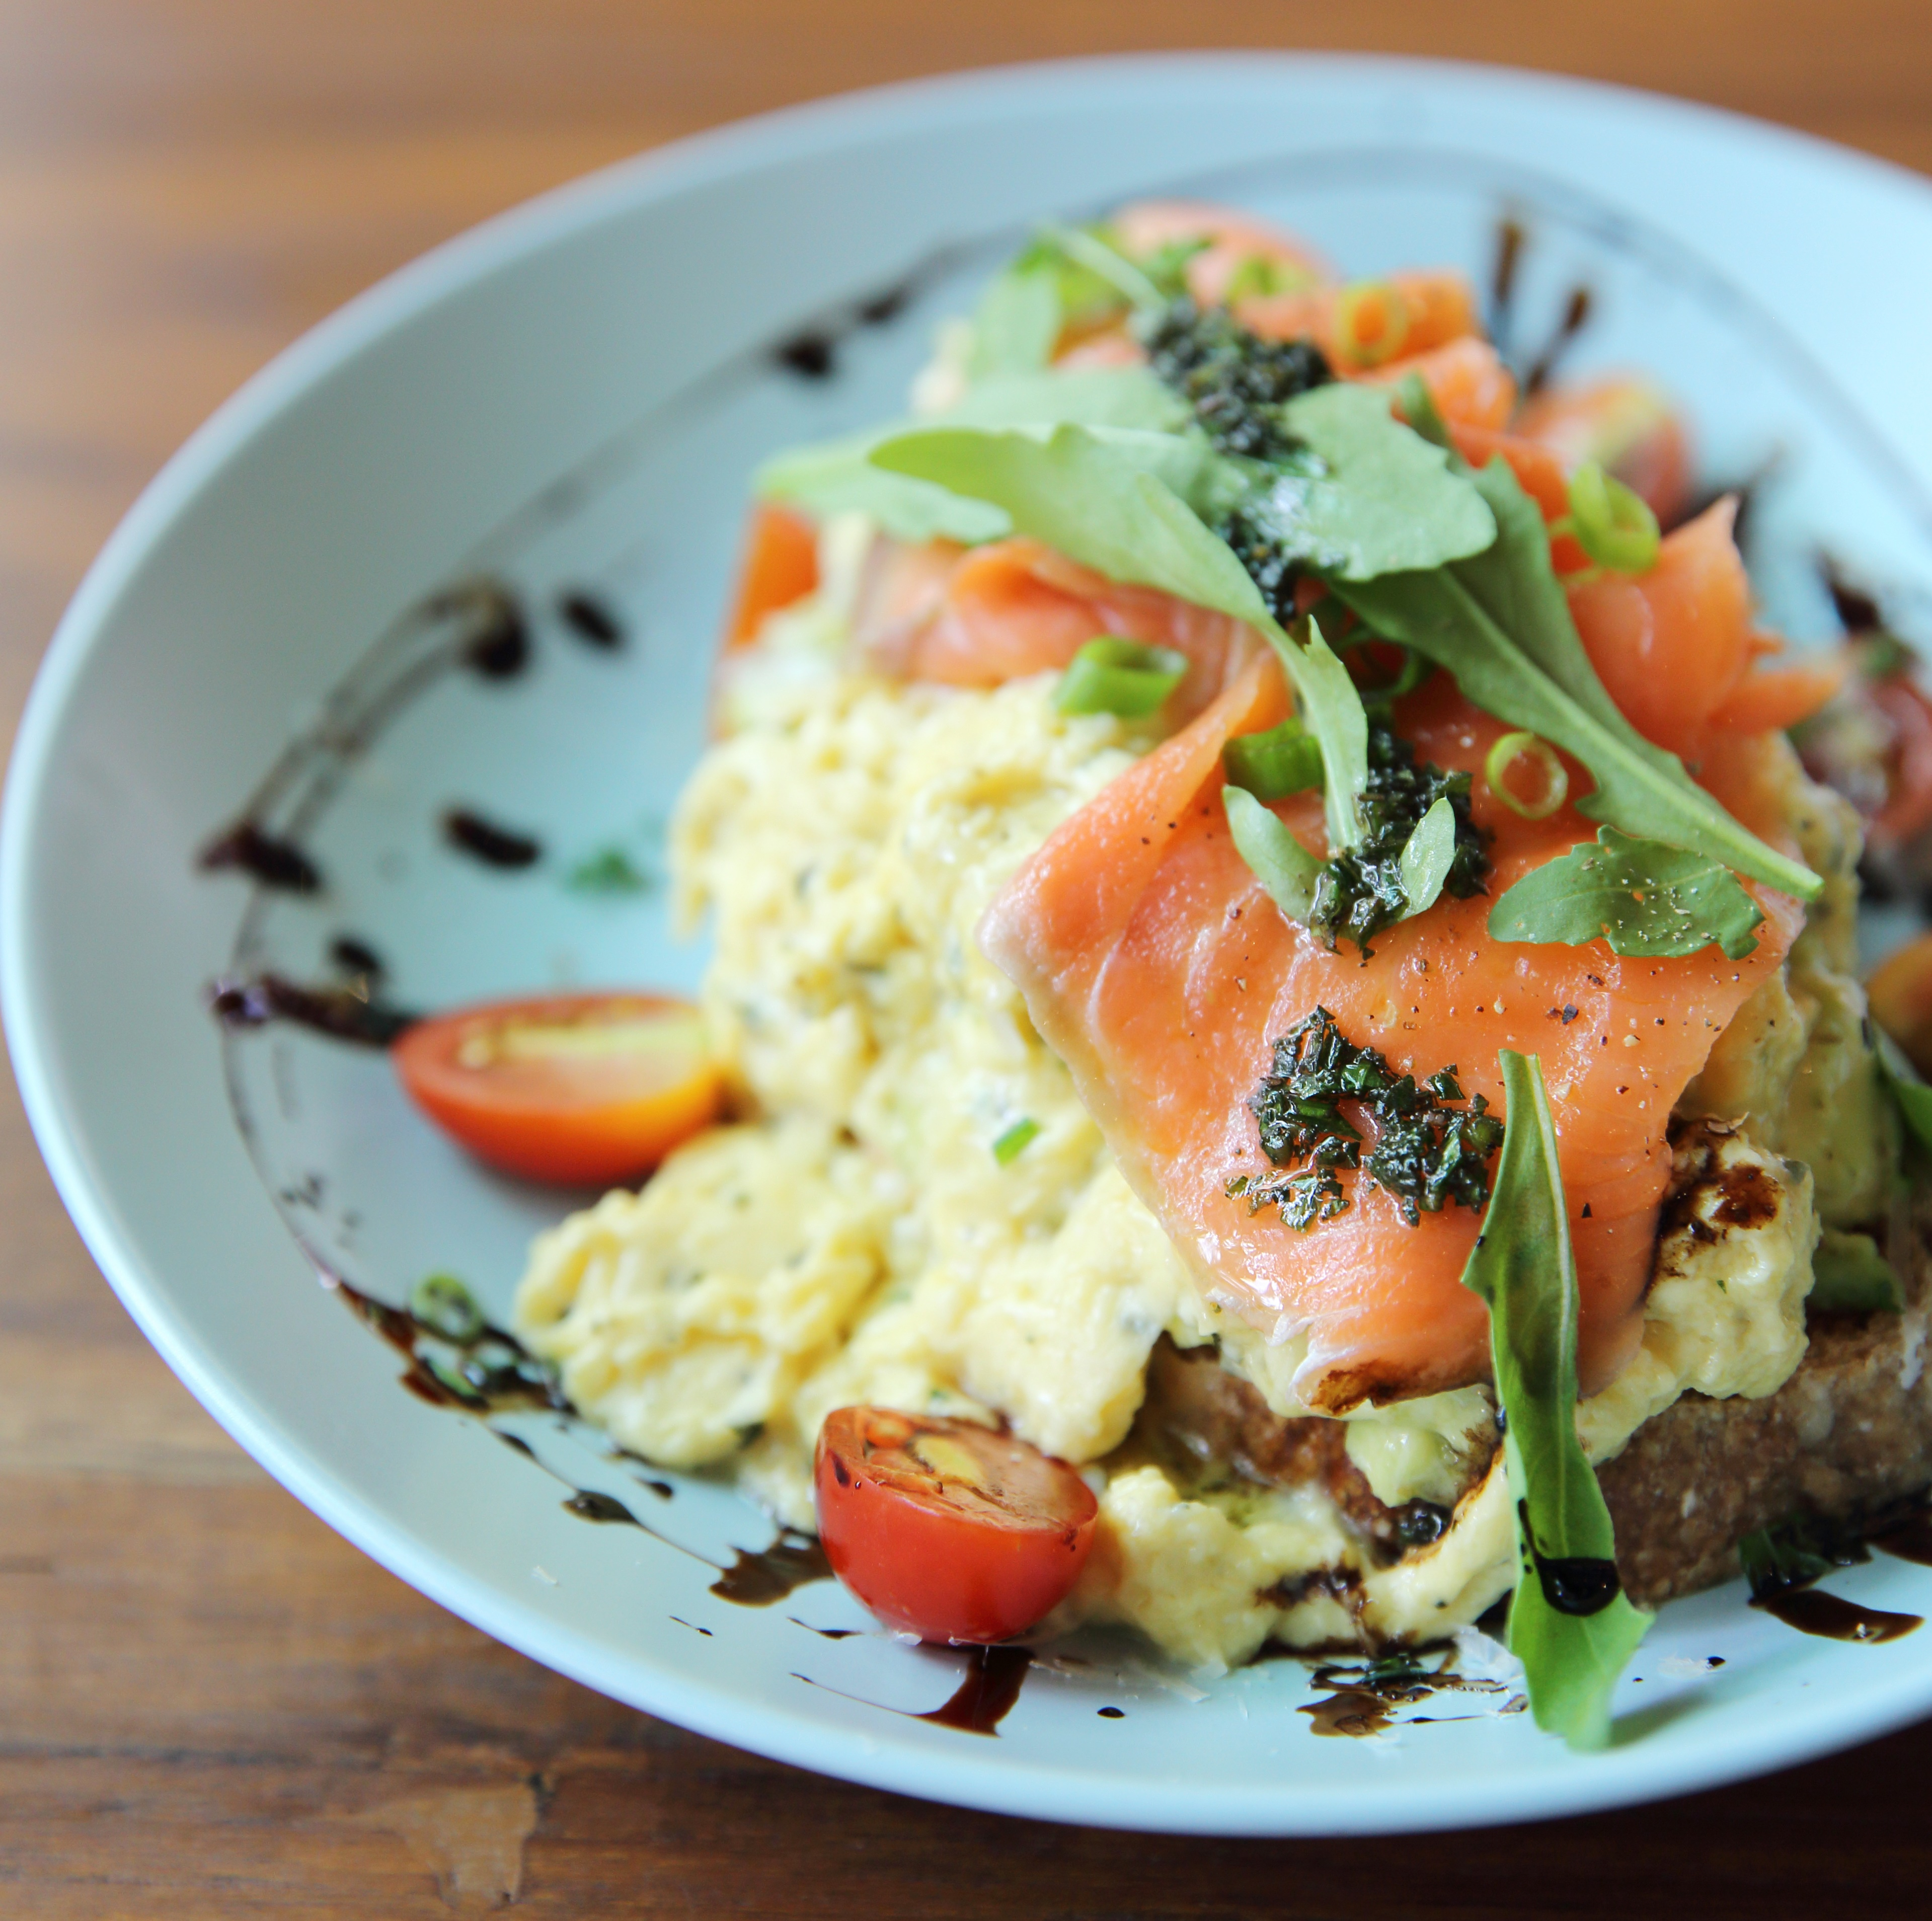 Scrambled Eggs with Lox (Smoked Salmon) - BigOven